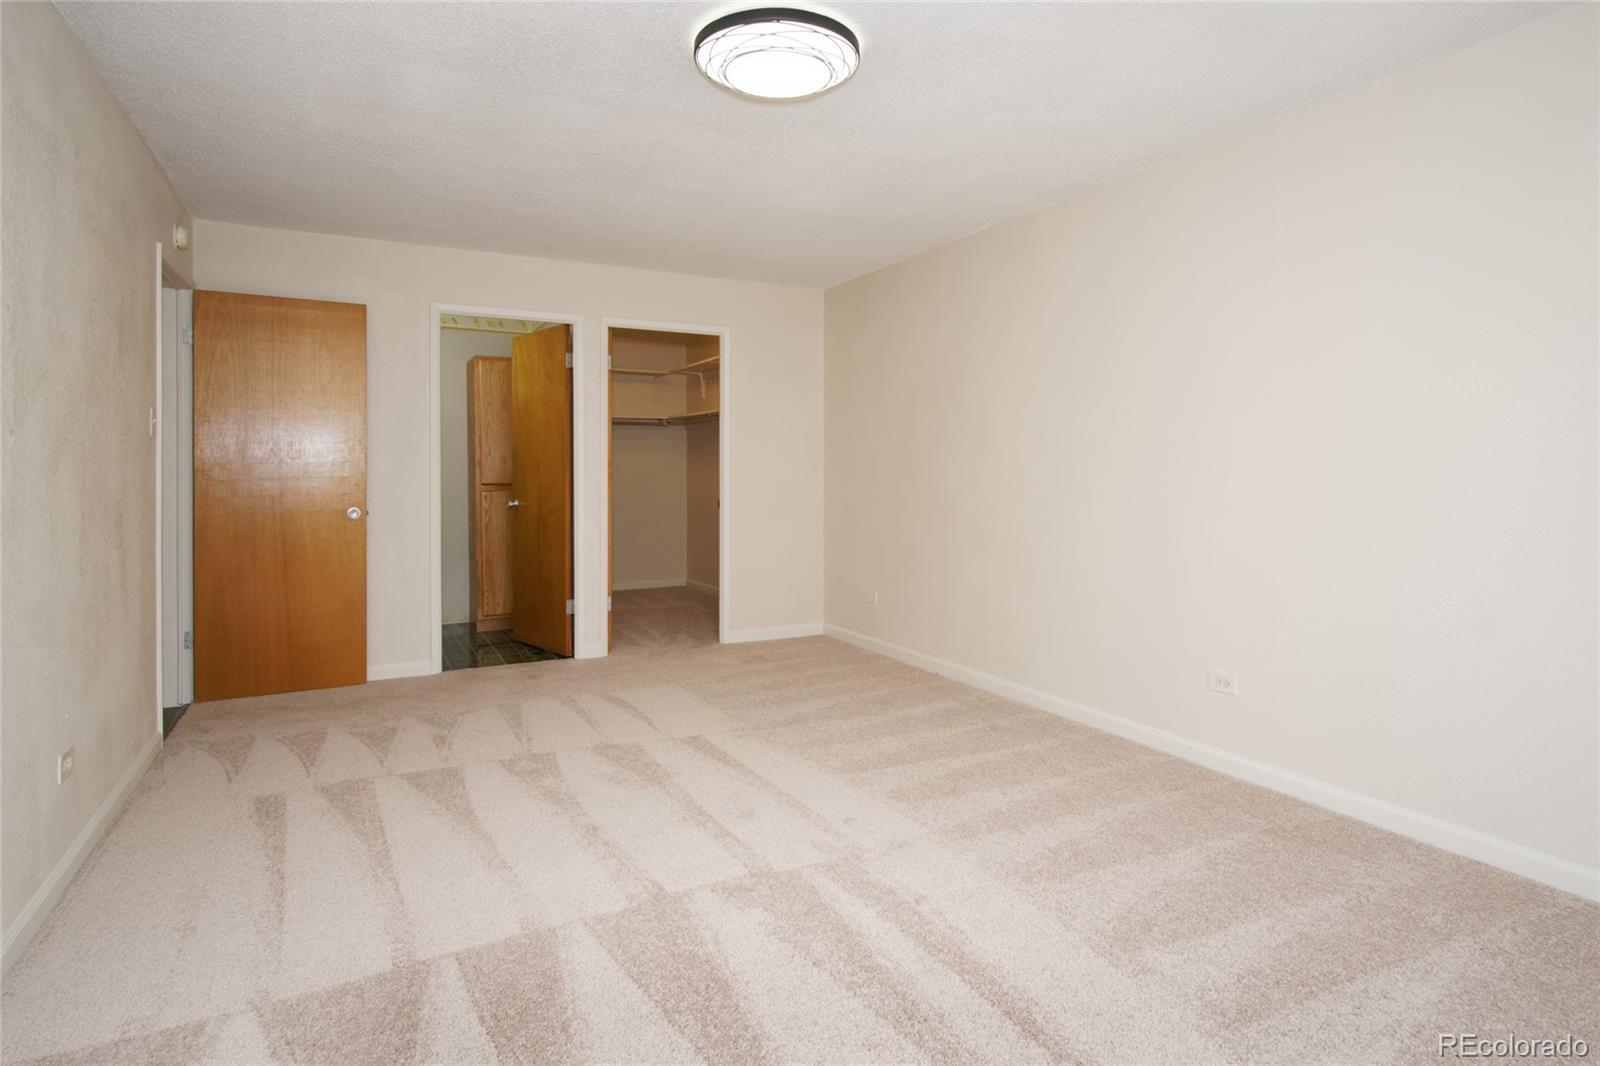 MLS# 3287239 - 24 - 610 S Alton Way #3A, Denver, CO 80247